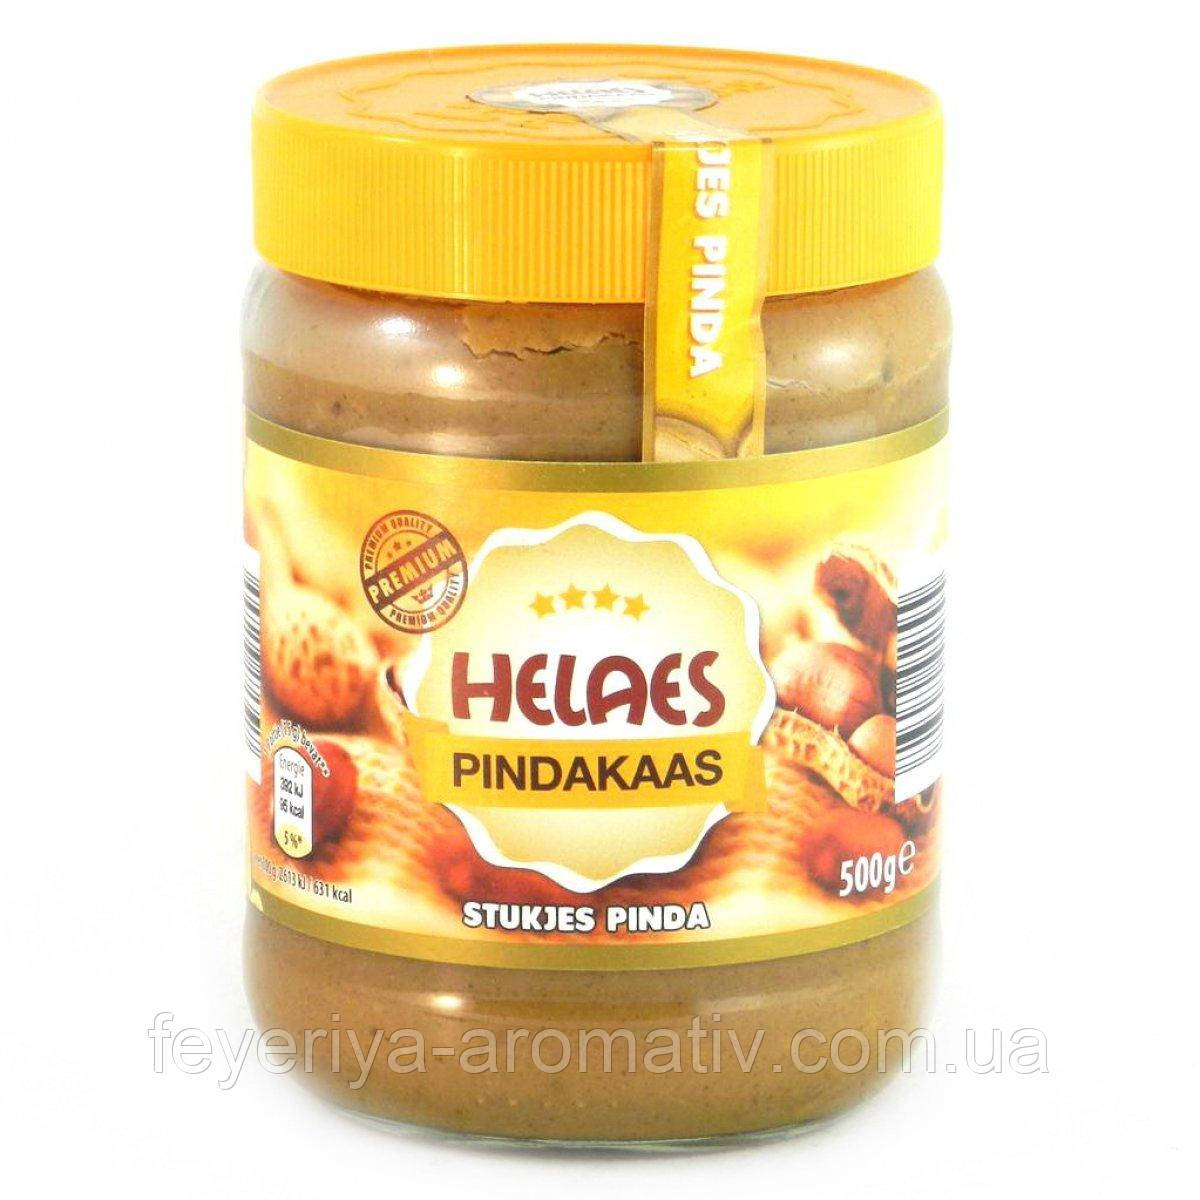 Арахисовое масло Helaes Pindakaas stukjes pinda, 600гр (Голандия)